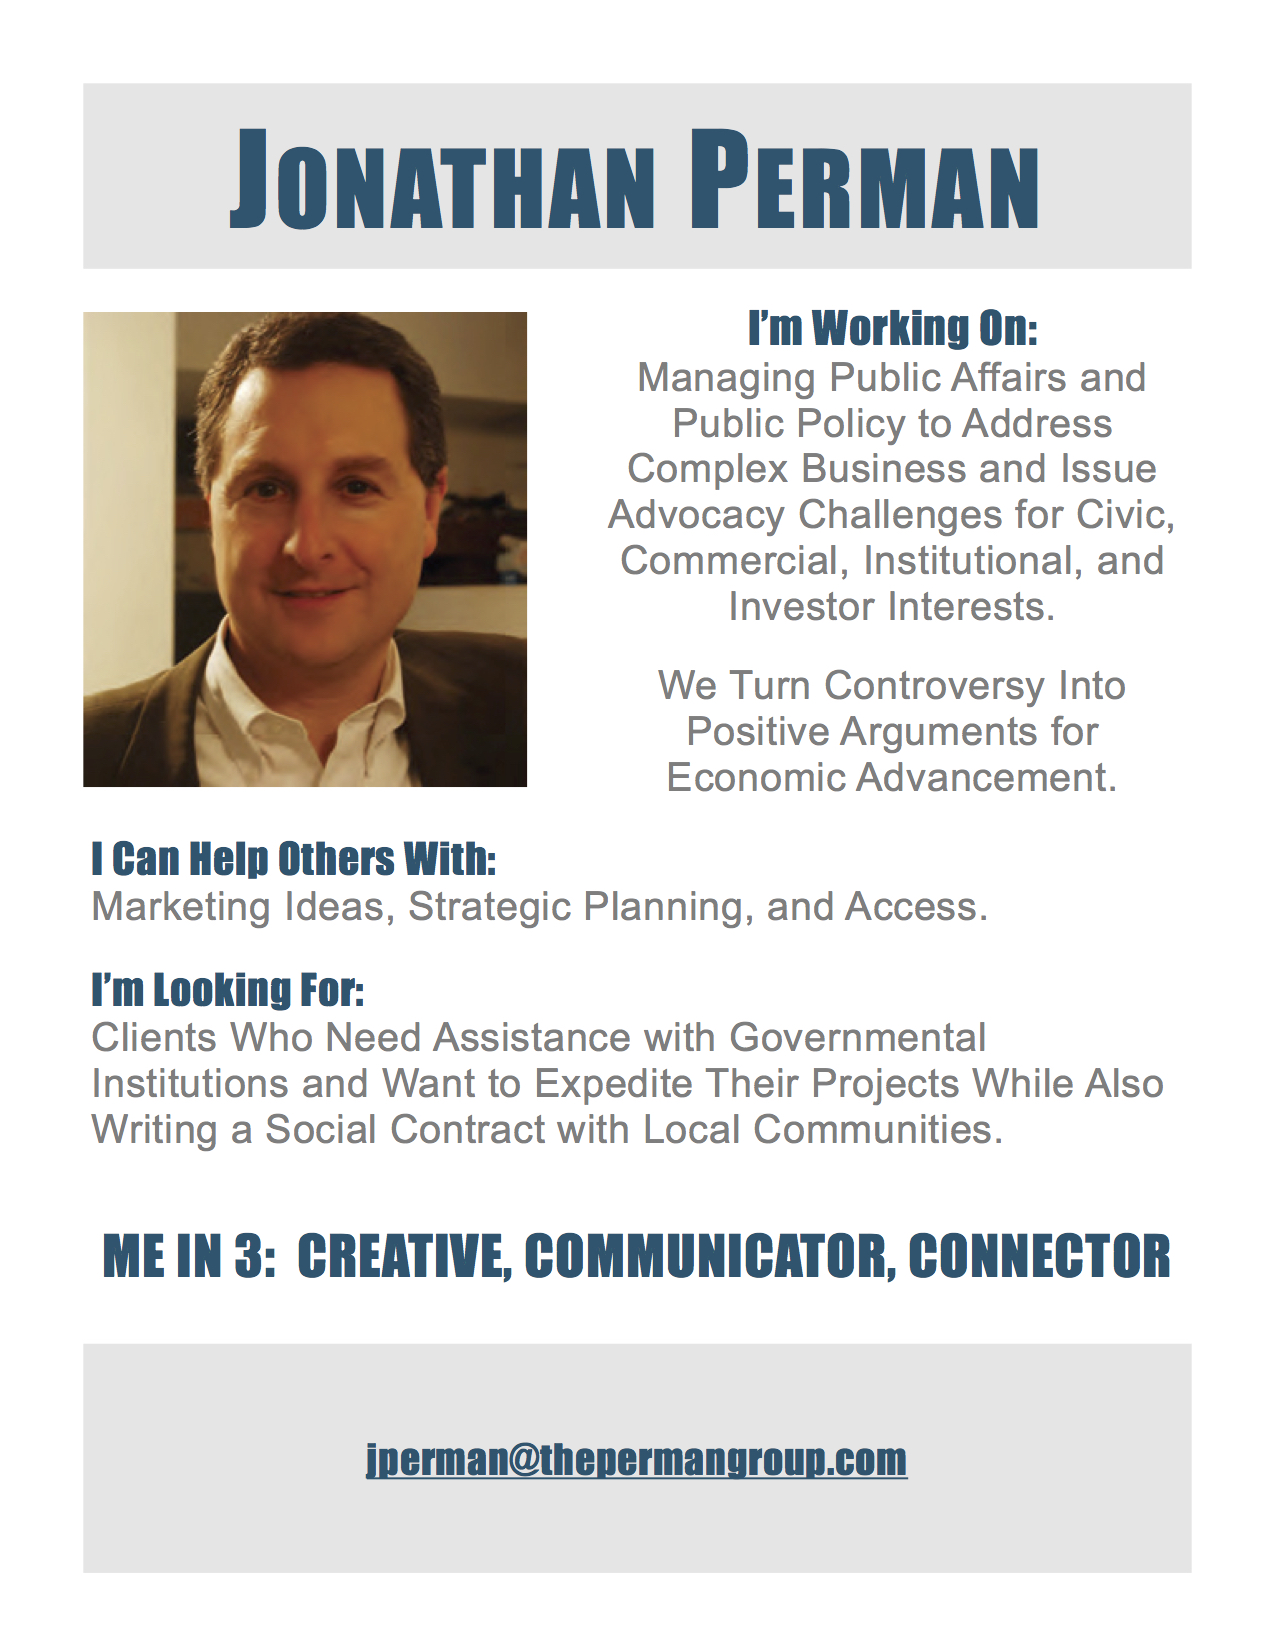 Jonathan Perman